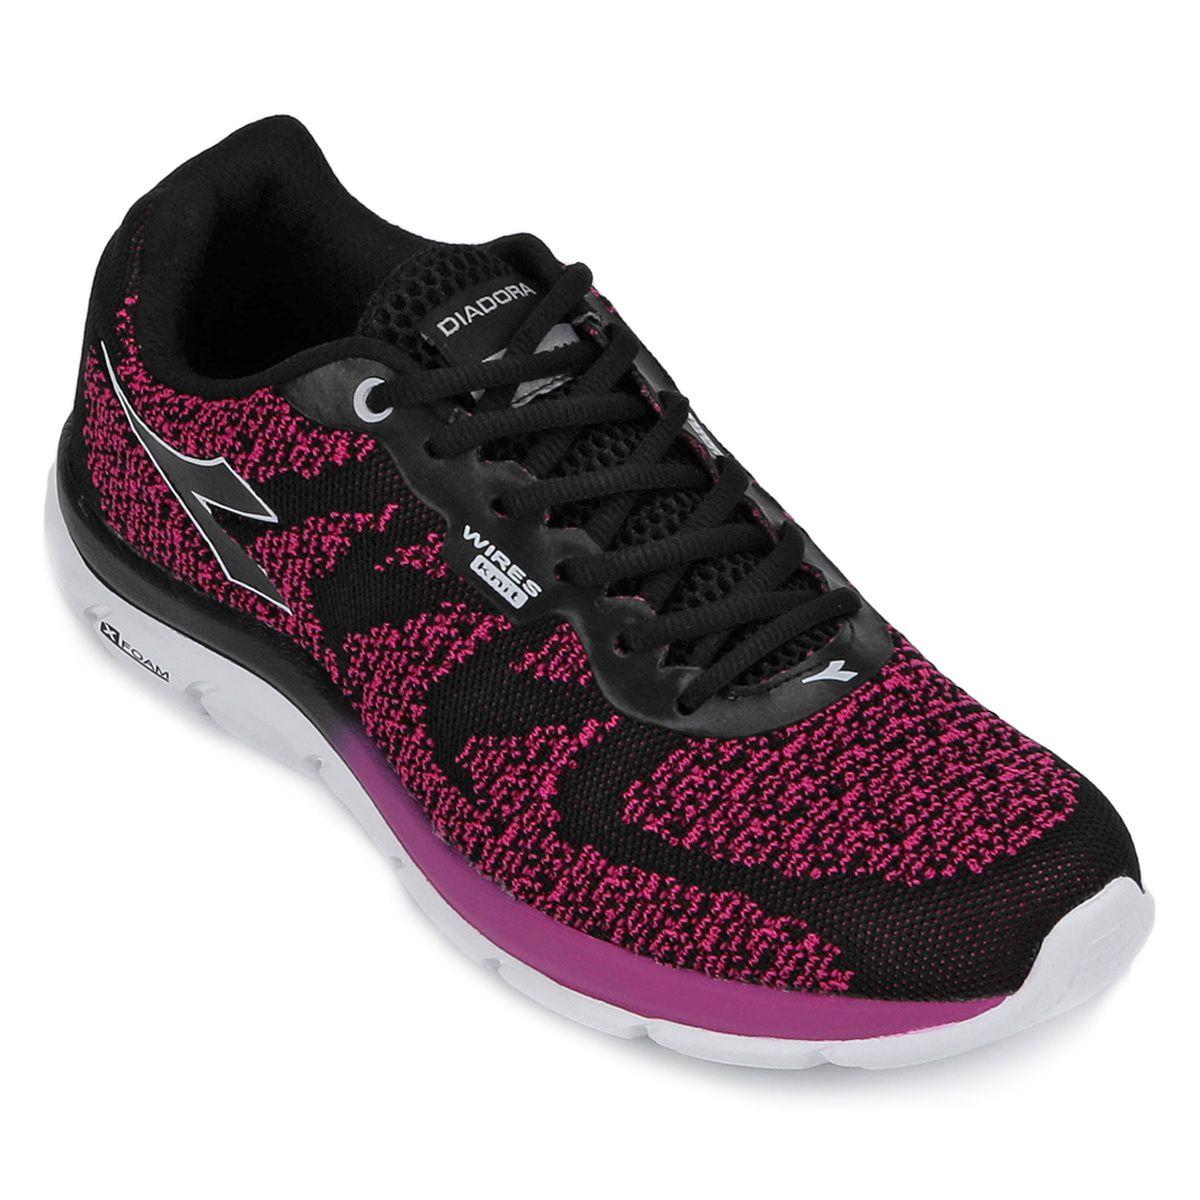 Tenis Diadora Flock Knit Corrida Pink